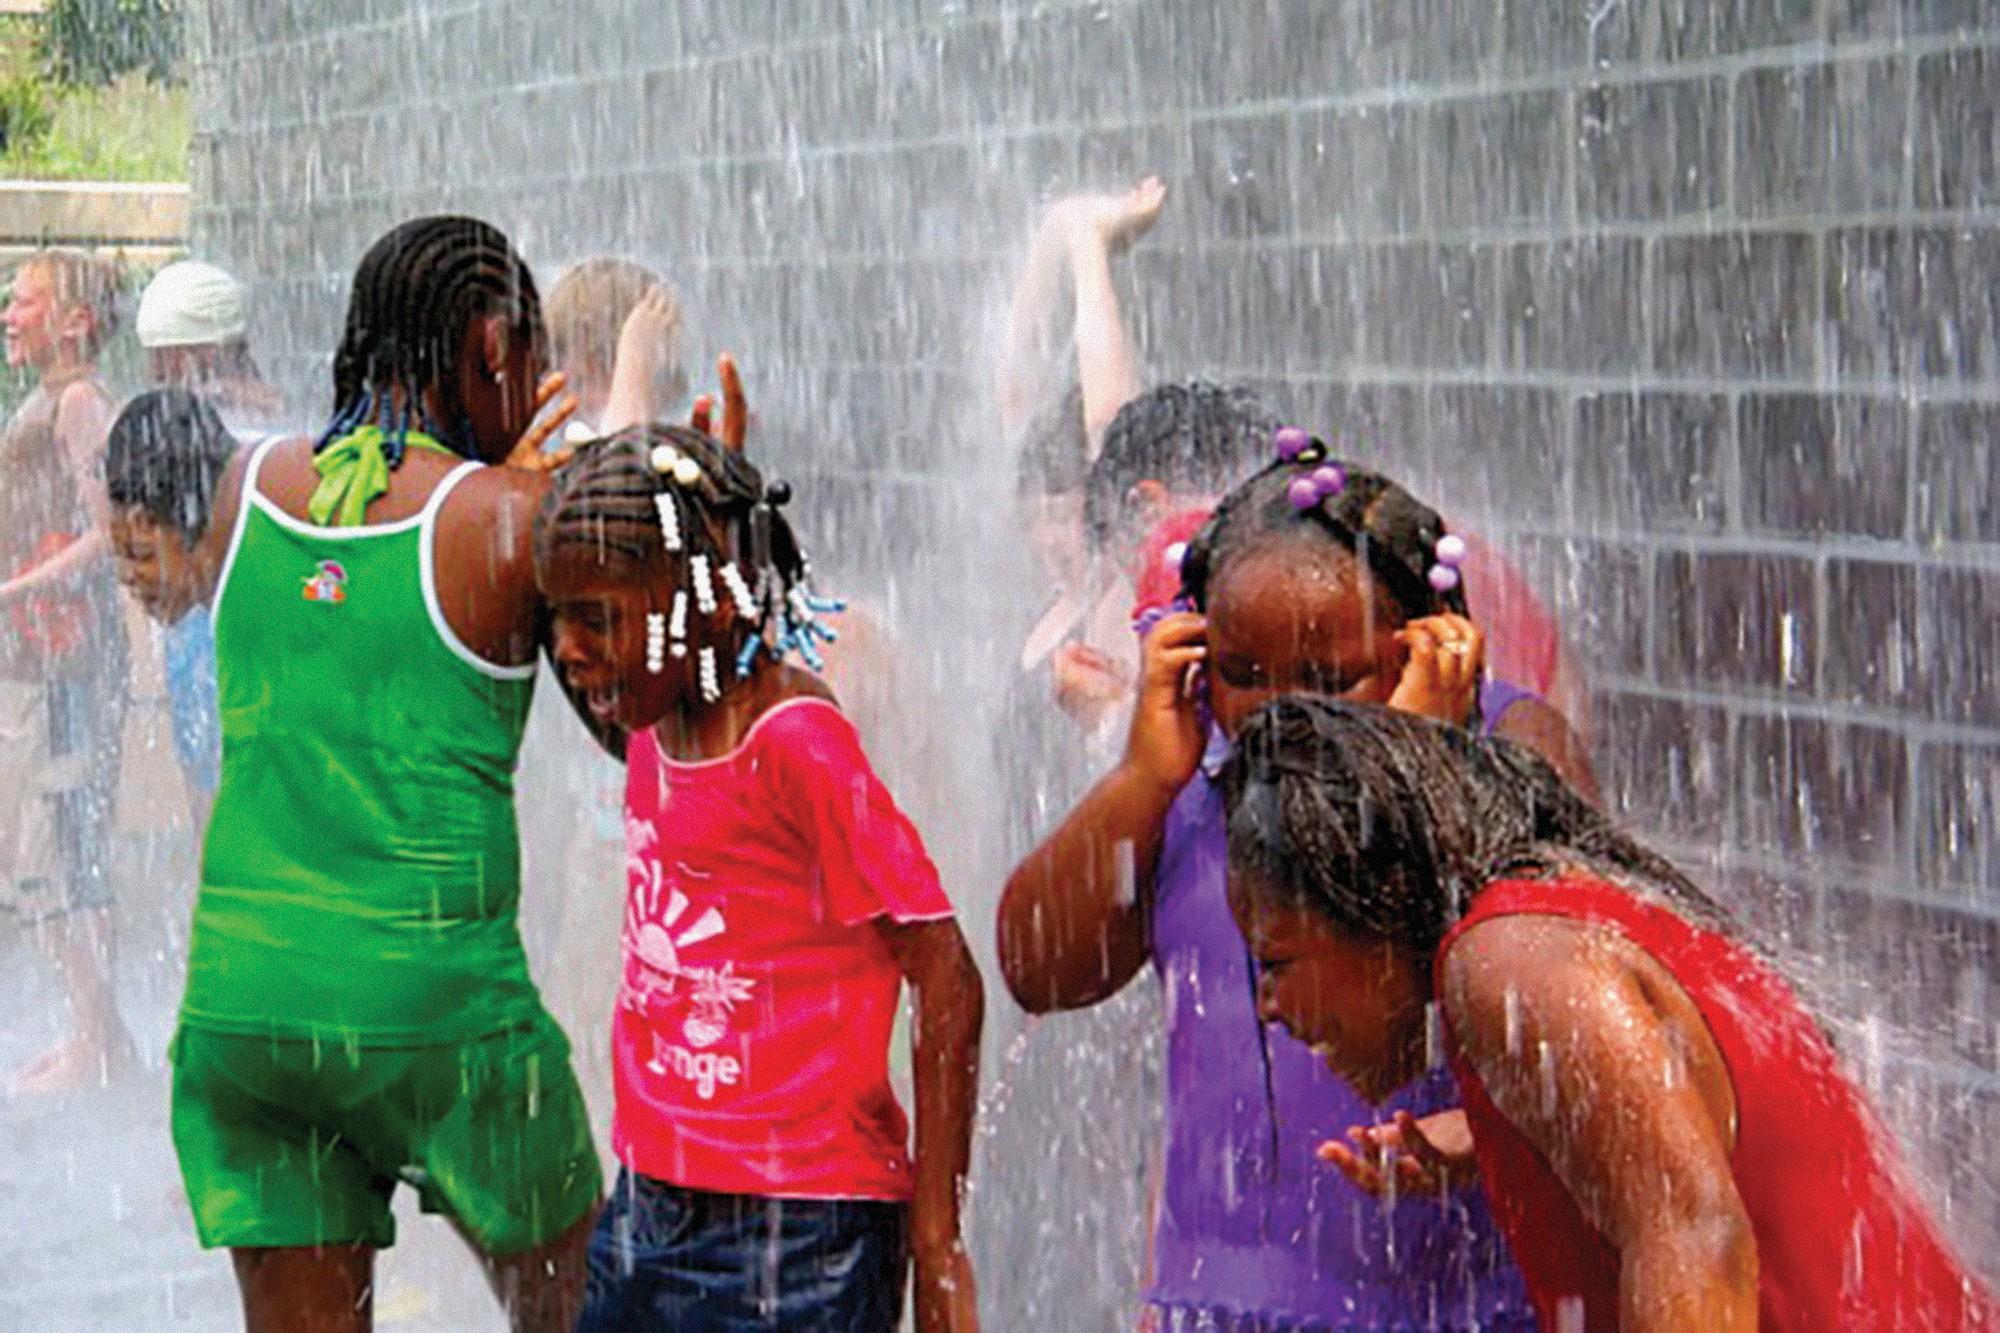 Parks Amp Public Spaces 183 Topics Amp News 183 Chicago